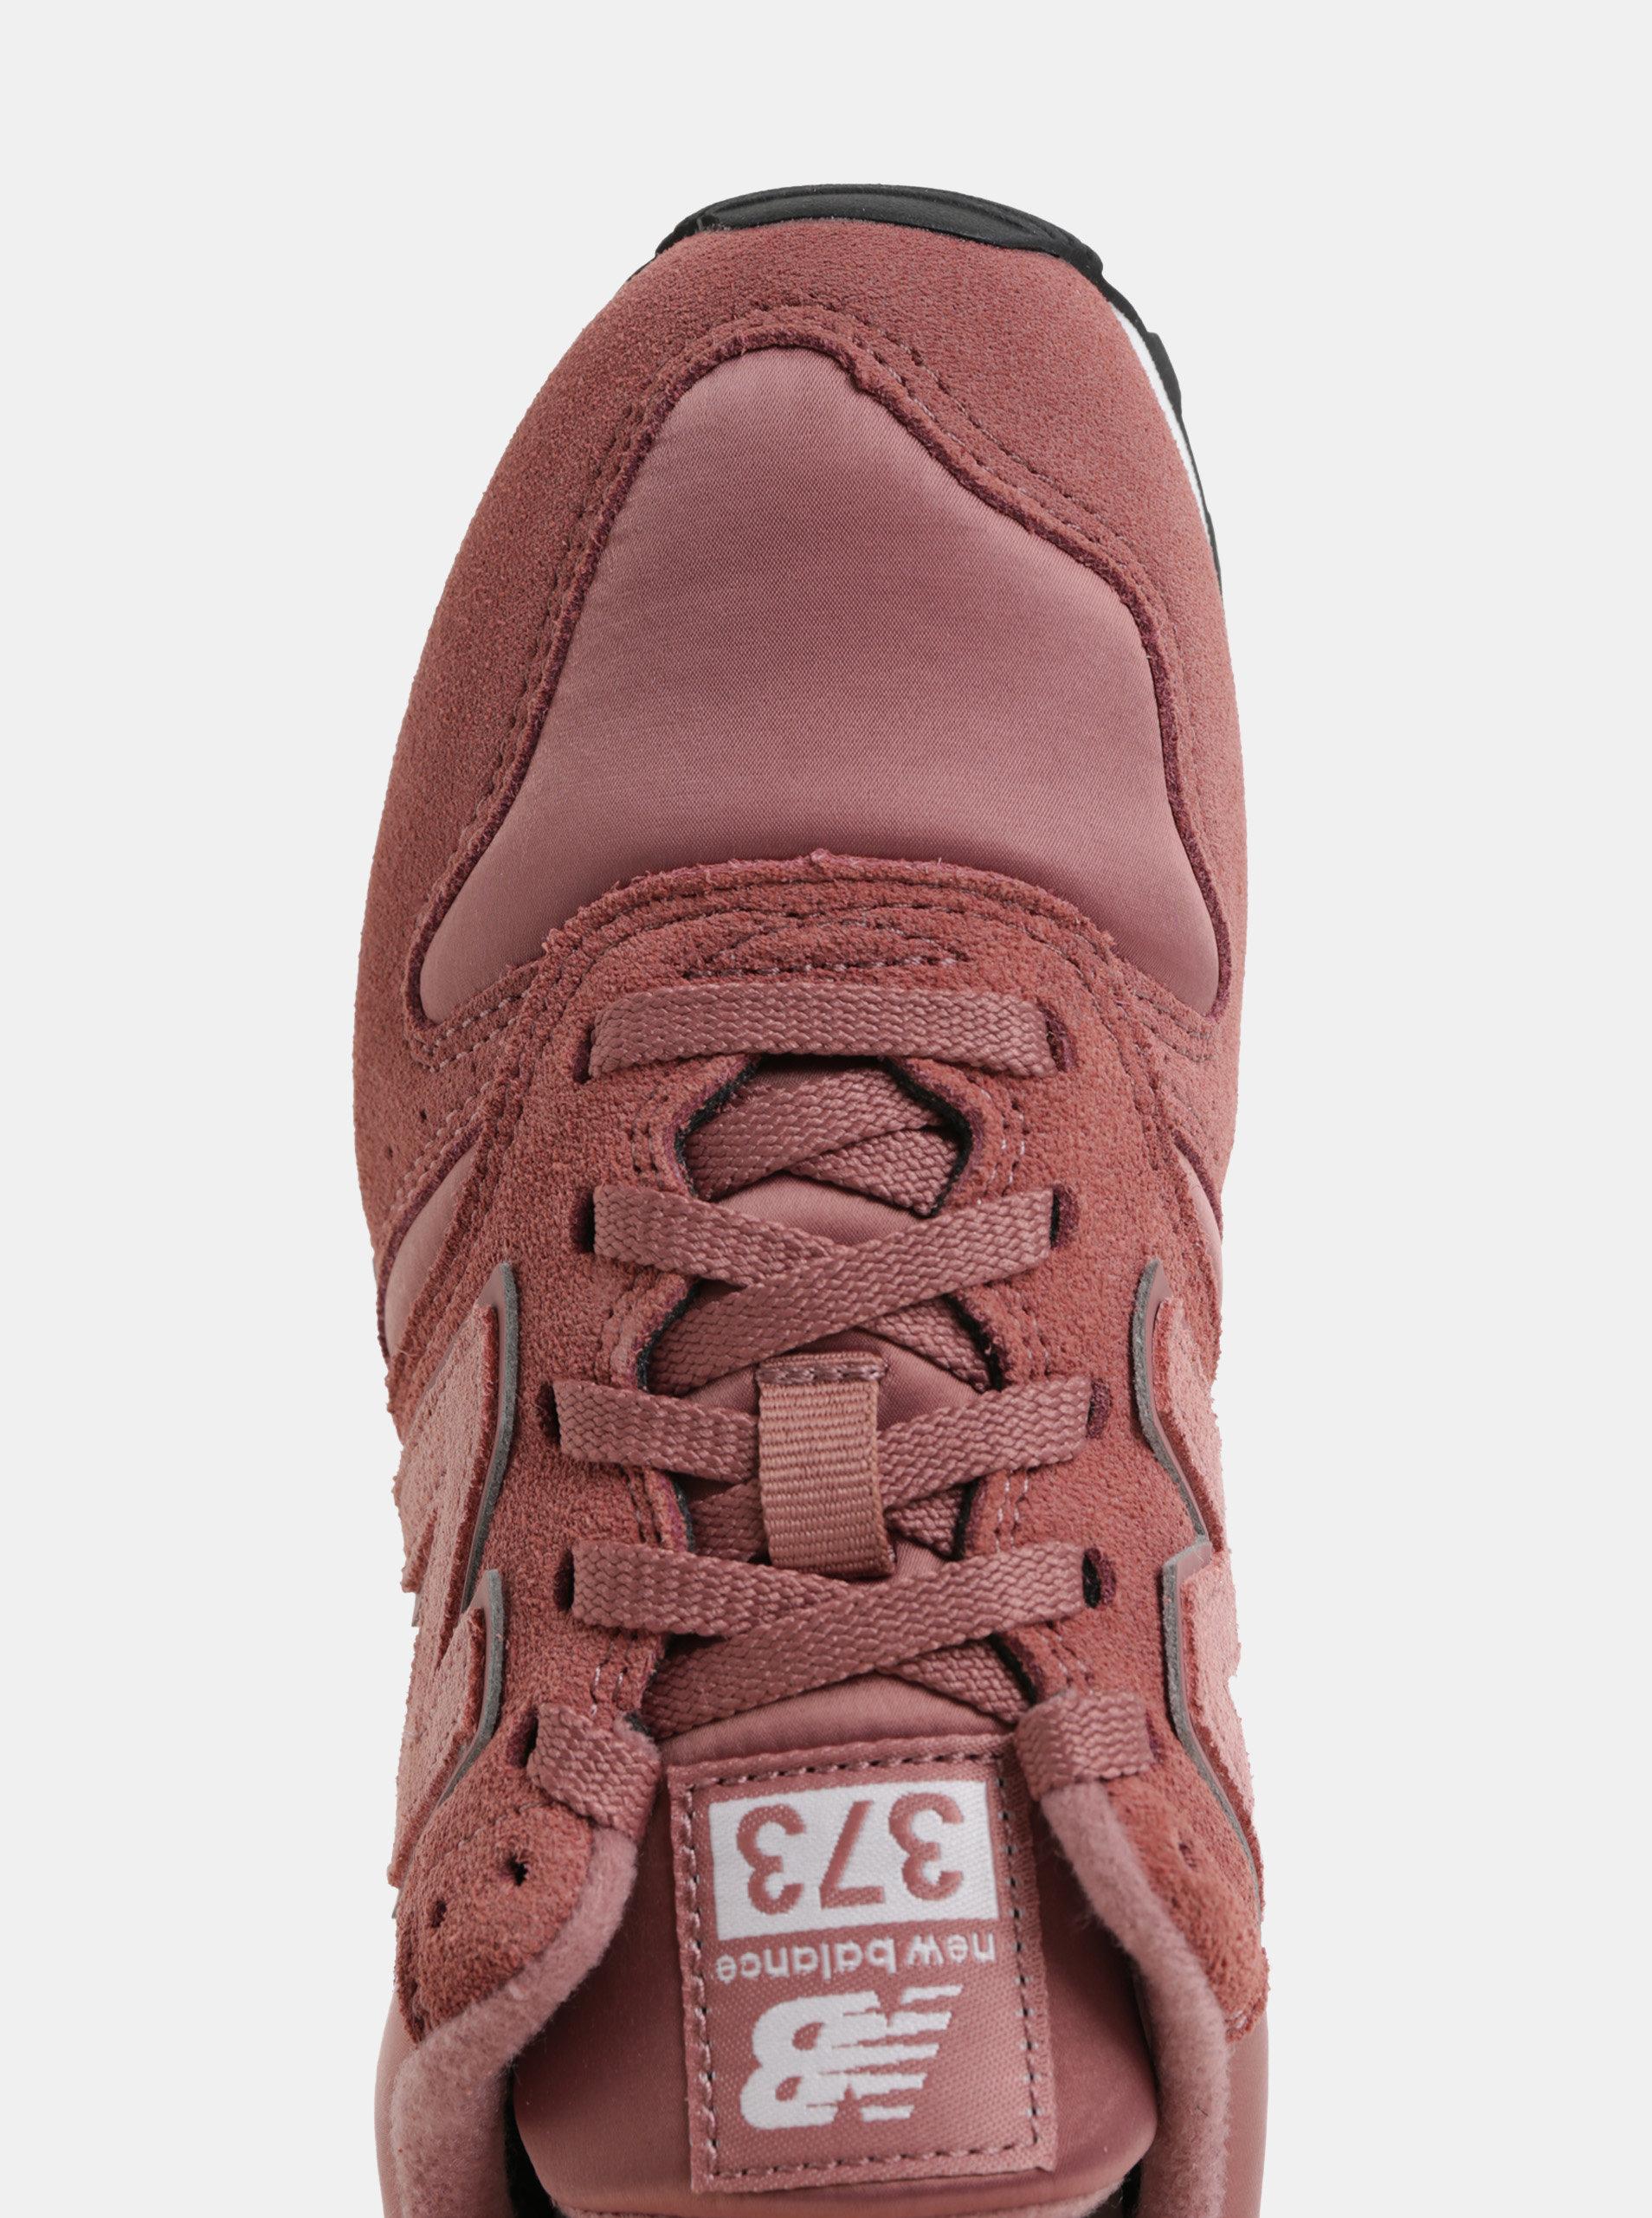 6e0de37aa153 Staroružové dámske semišové tenisky New Balance 373 ...